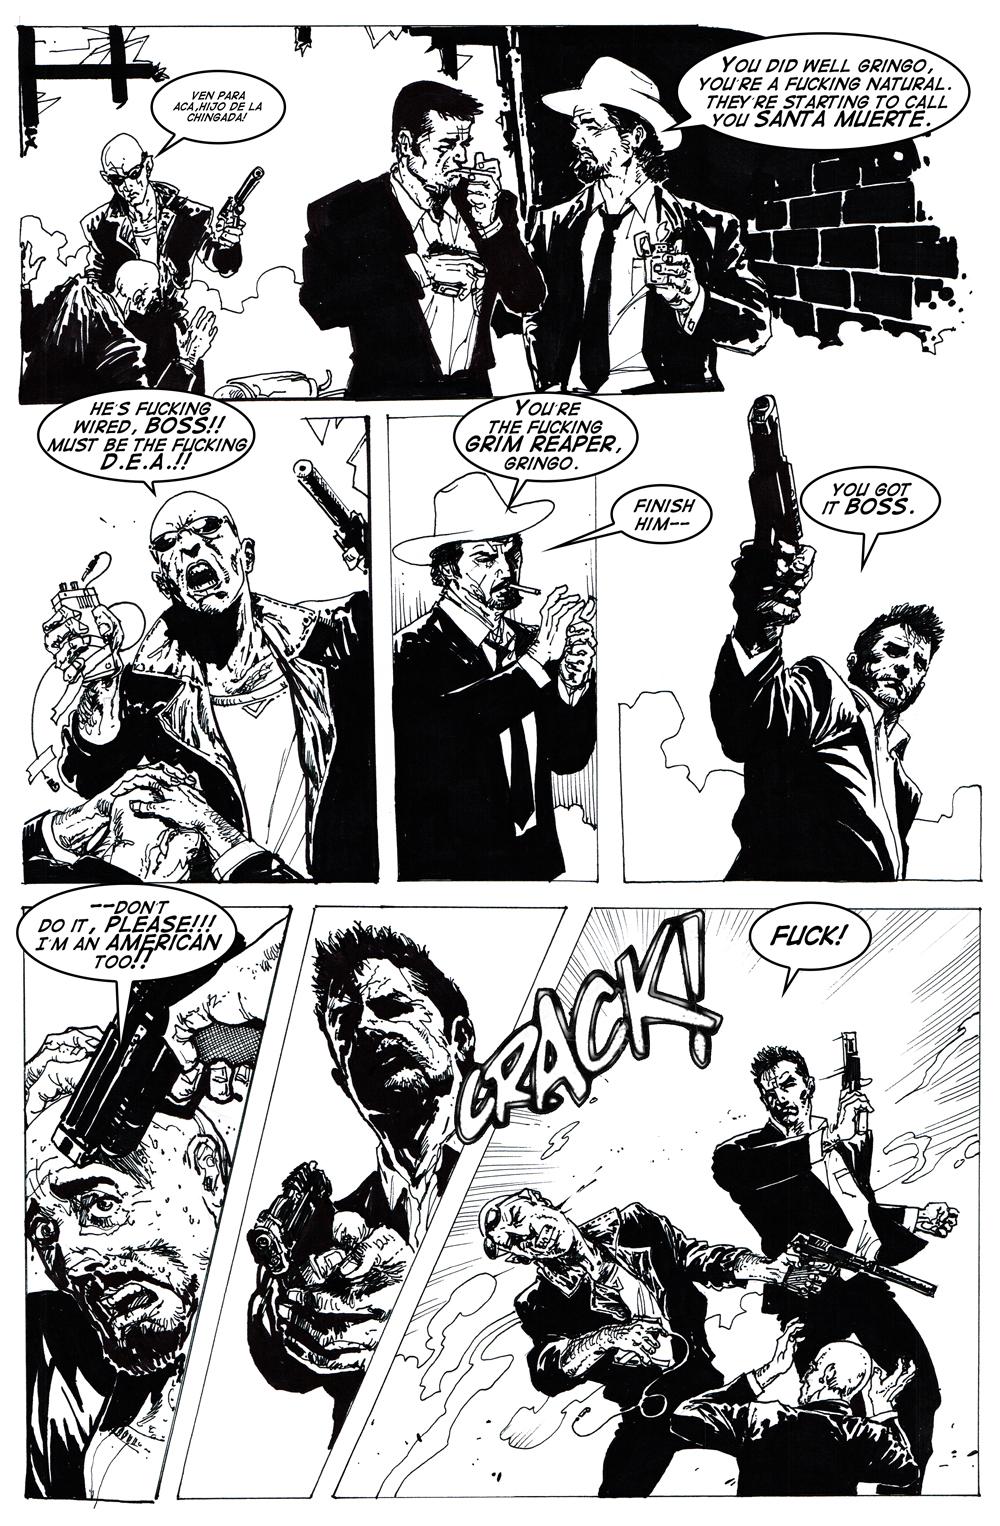 Old Skull Comics: PSYCARIO: Volume One